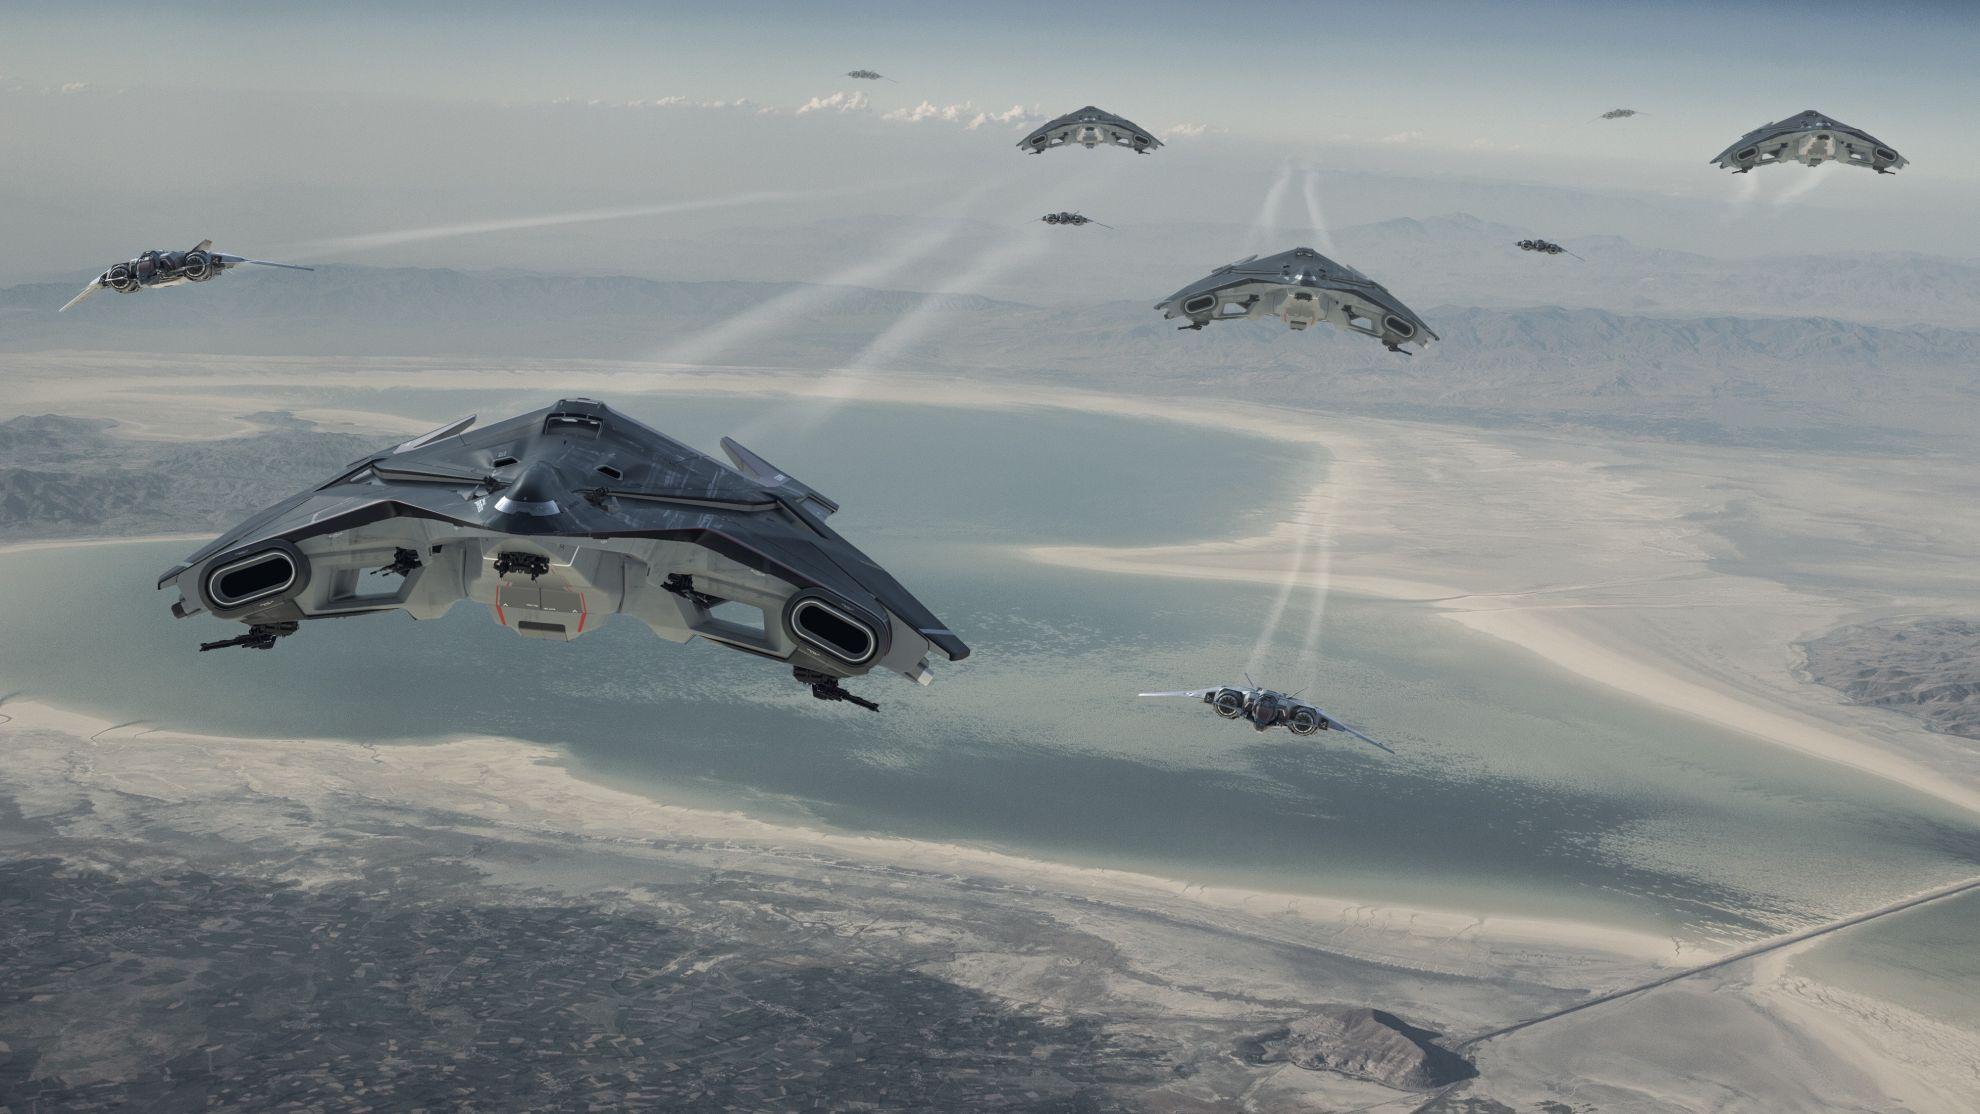 CRUS_Starlifter_Promo_Gunship_Formation_MO01-Squashed_.jpg